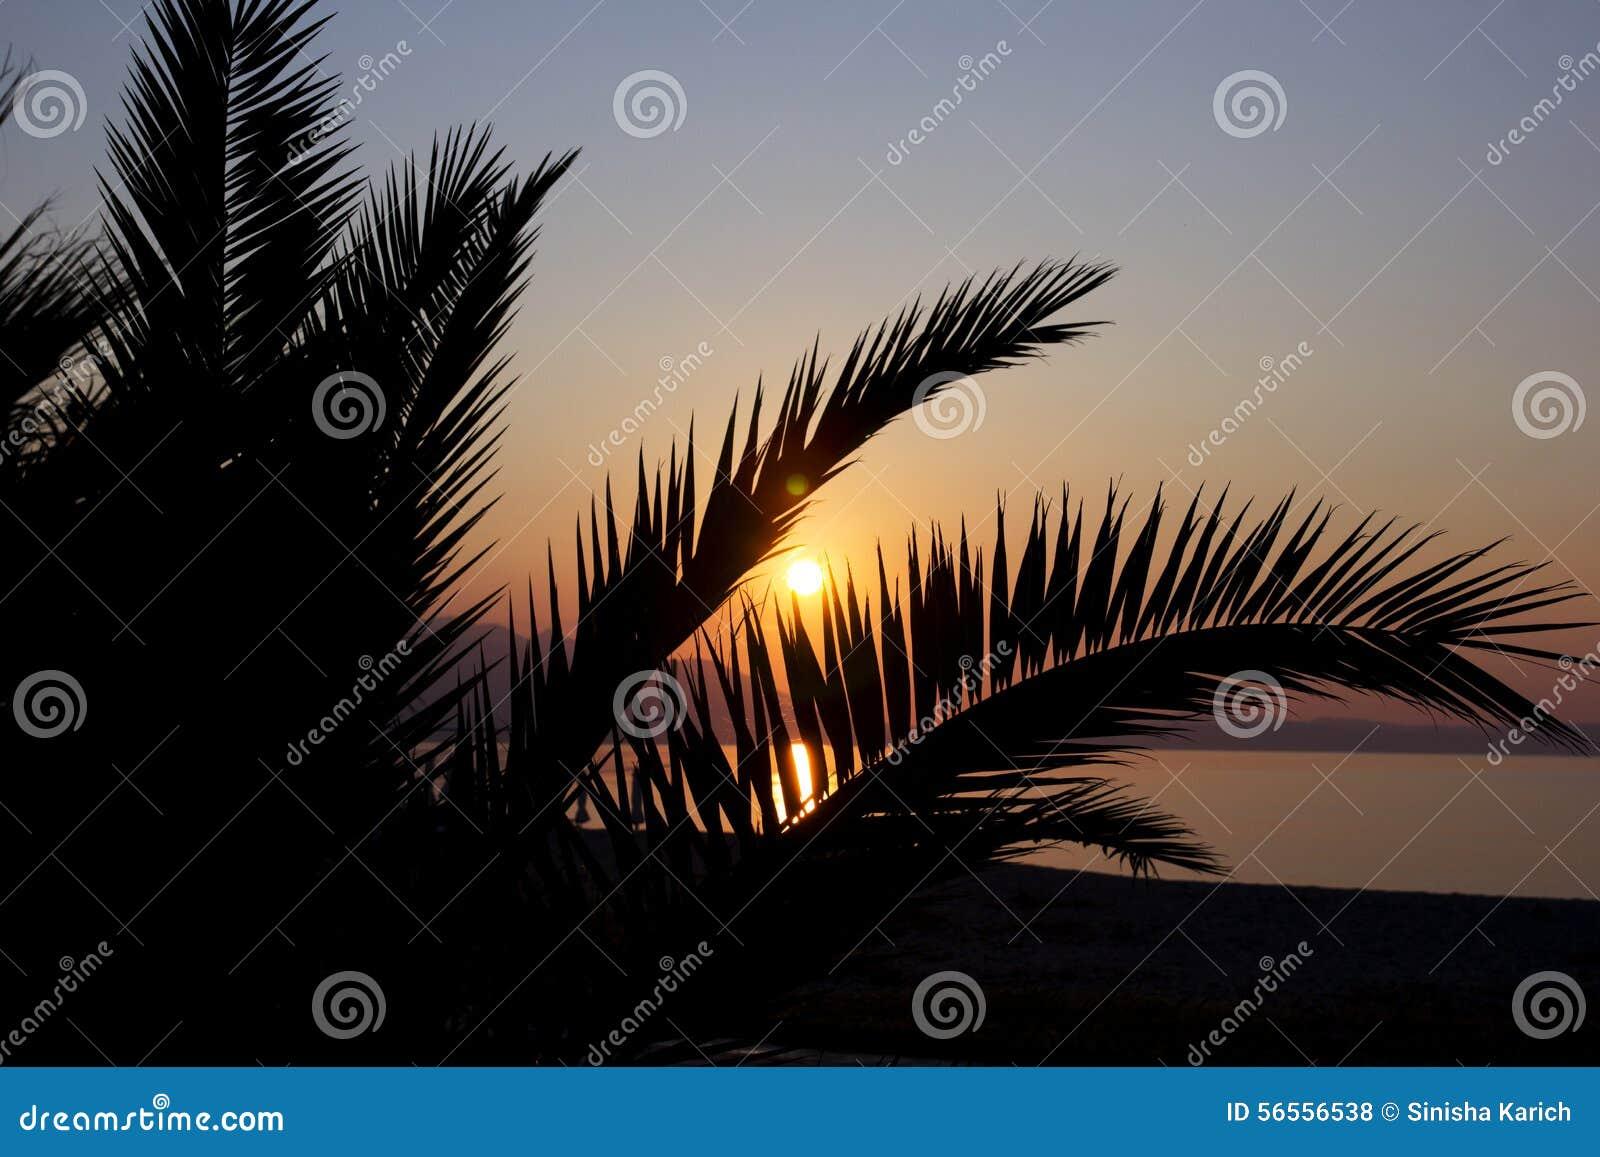 Download Φωτογραφία που λαμβάνεται στο μεσογειακό νησί Κορσική Στοκ Εικόνες - εικόνα από φύση, φως: 56556538